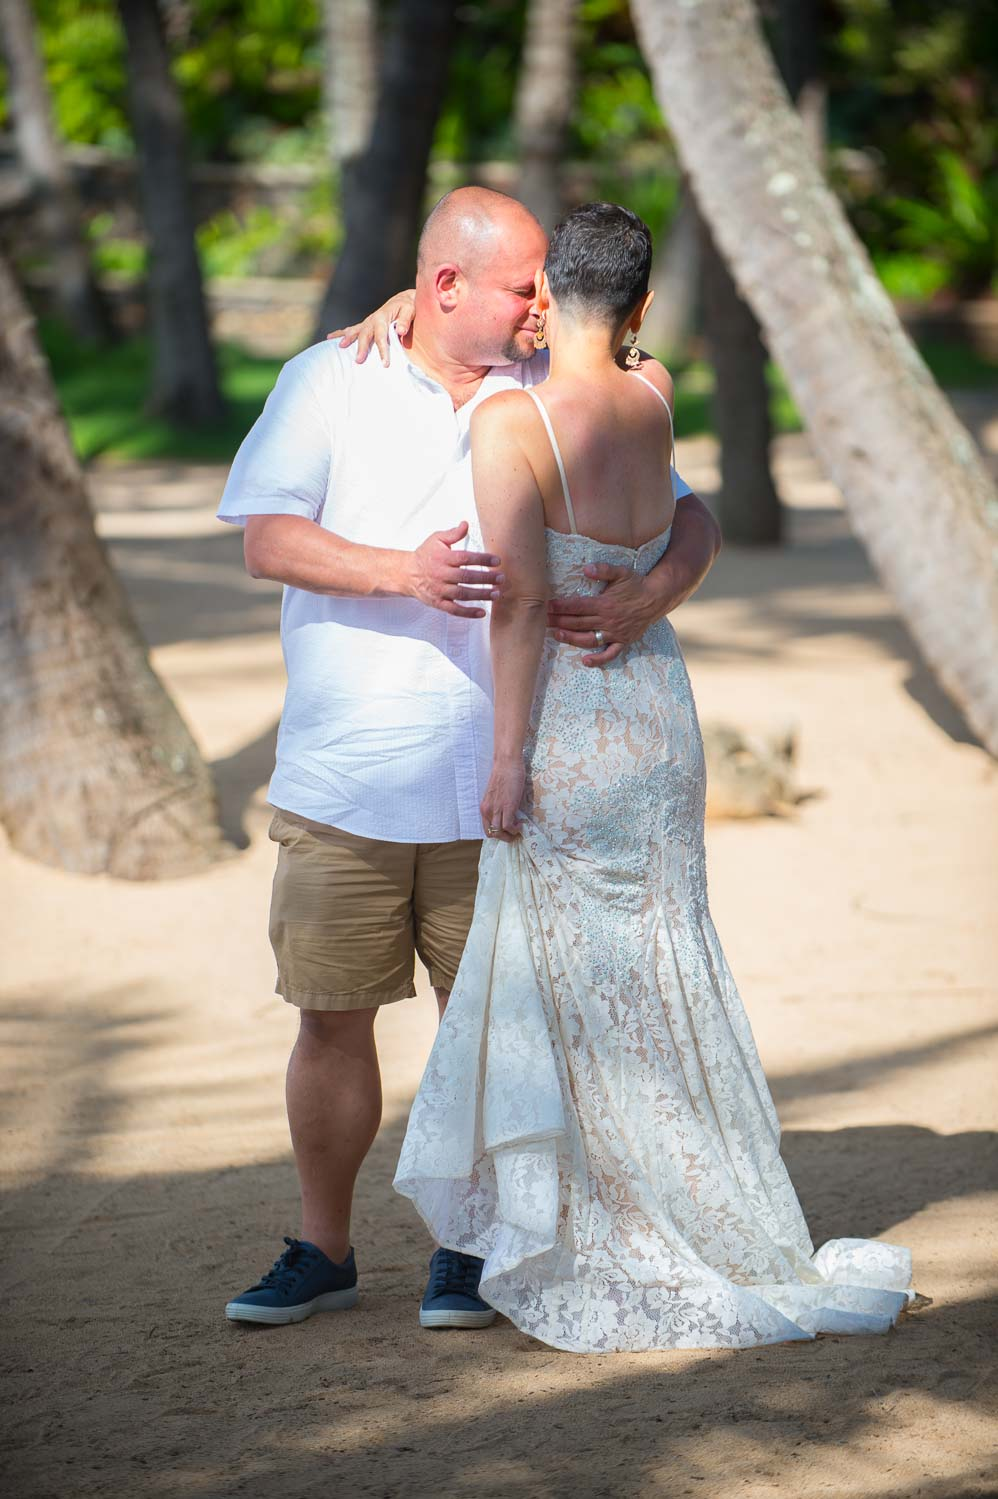 maui-wedding-photography-maui-wedding-venue-Tad-Craig-Photography-4-5.jpg